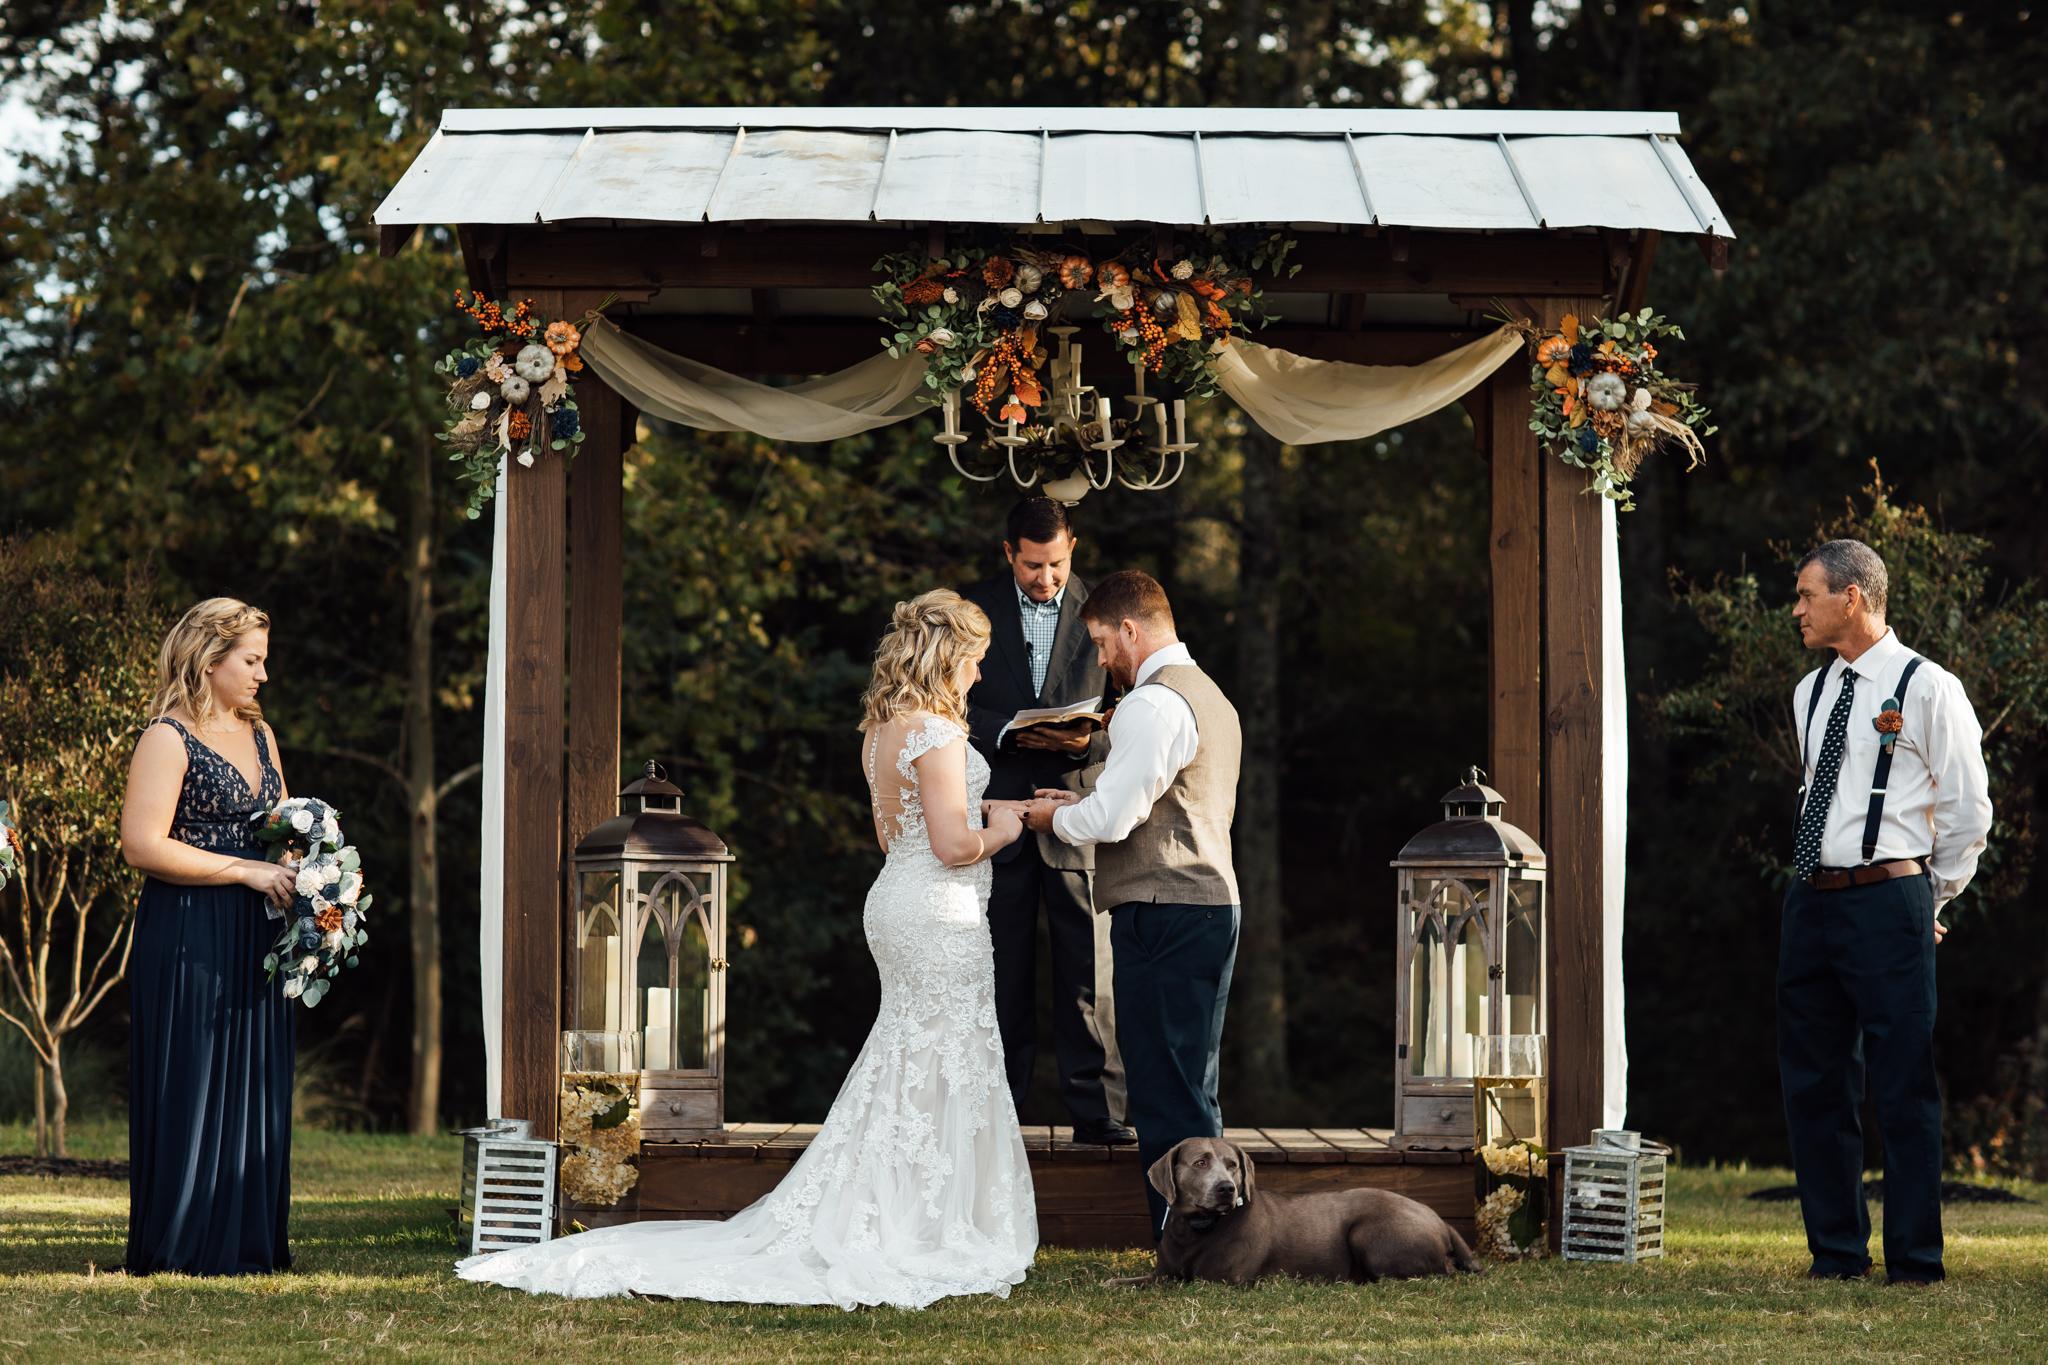 backyard-hernando-wedding-thewarmtharoundyou-memphis-wedding-photographesr (18 of 20).jpg